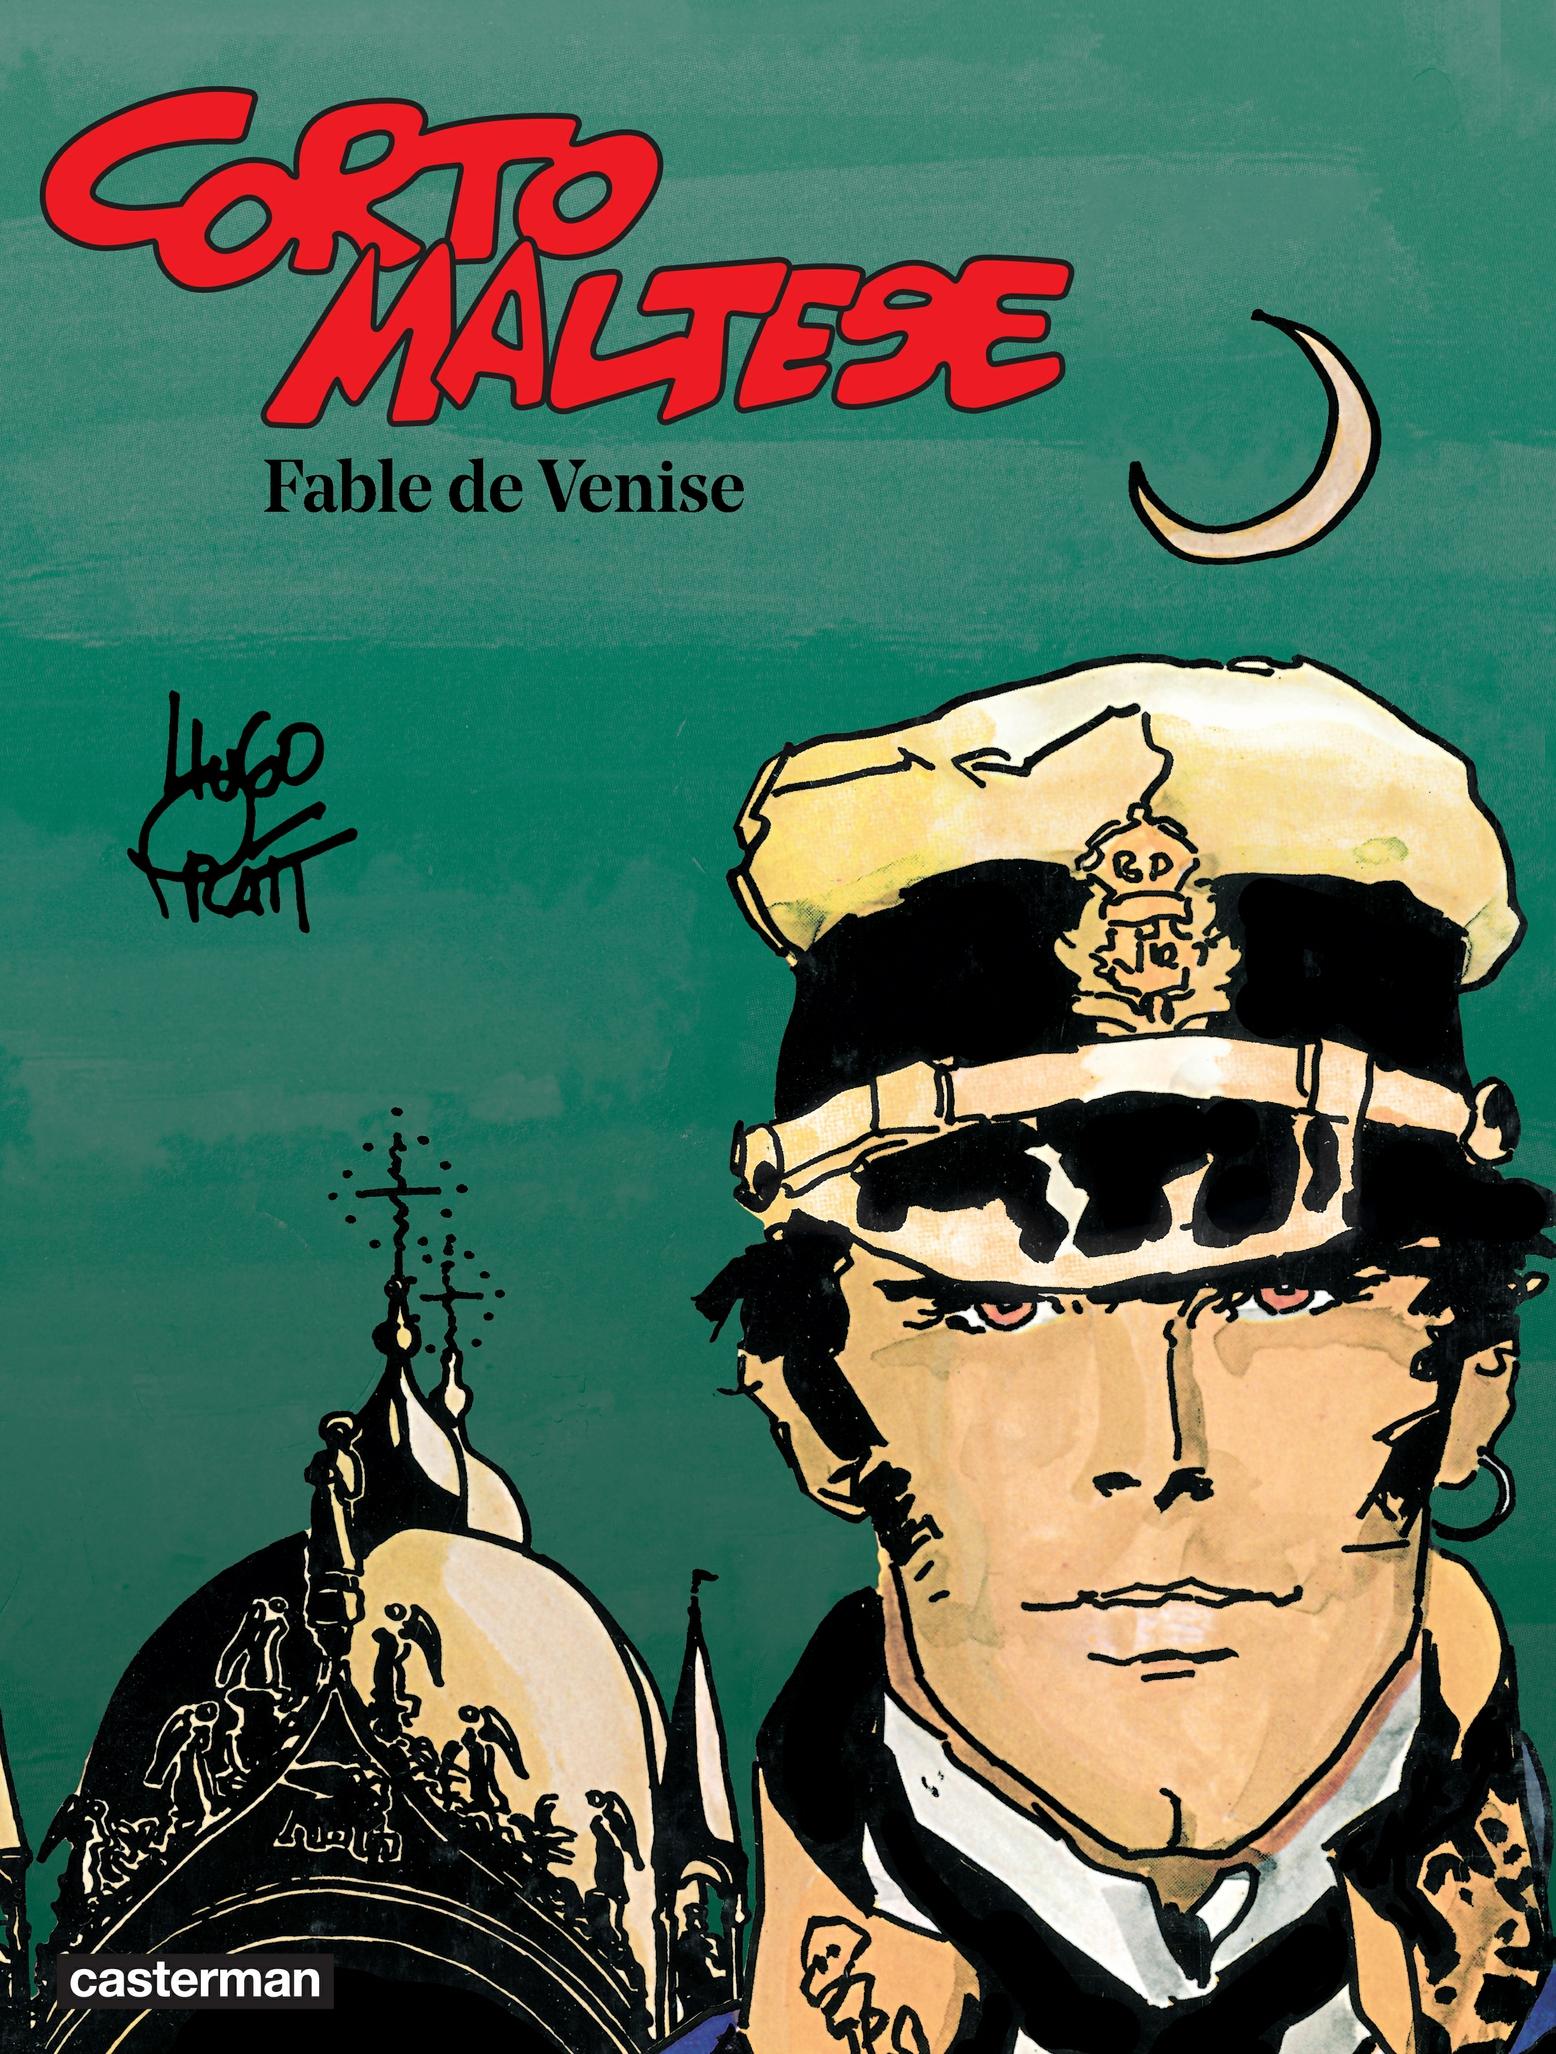 Corto Maltese (Tome 7) - Fable de Venise | Pratt, Hugo